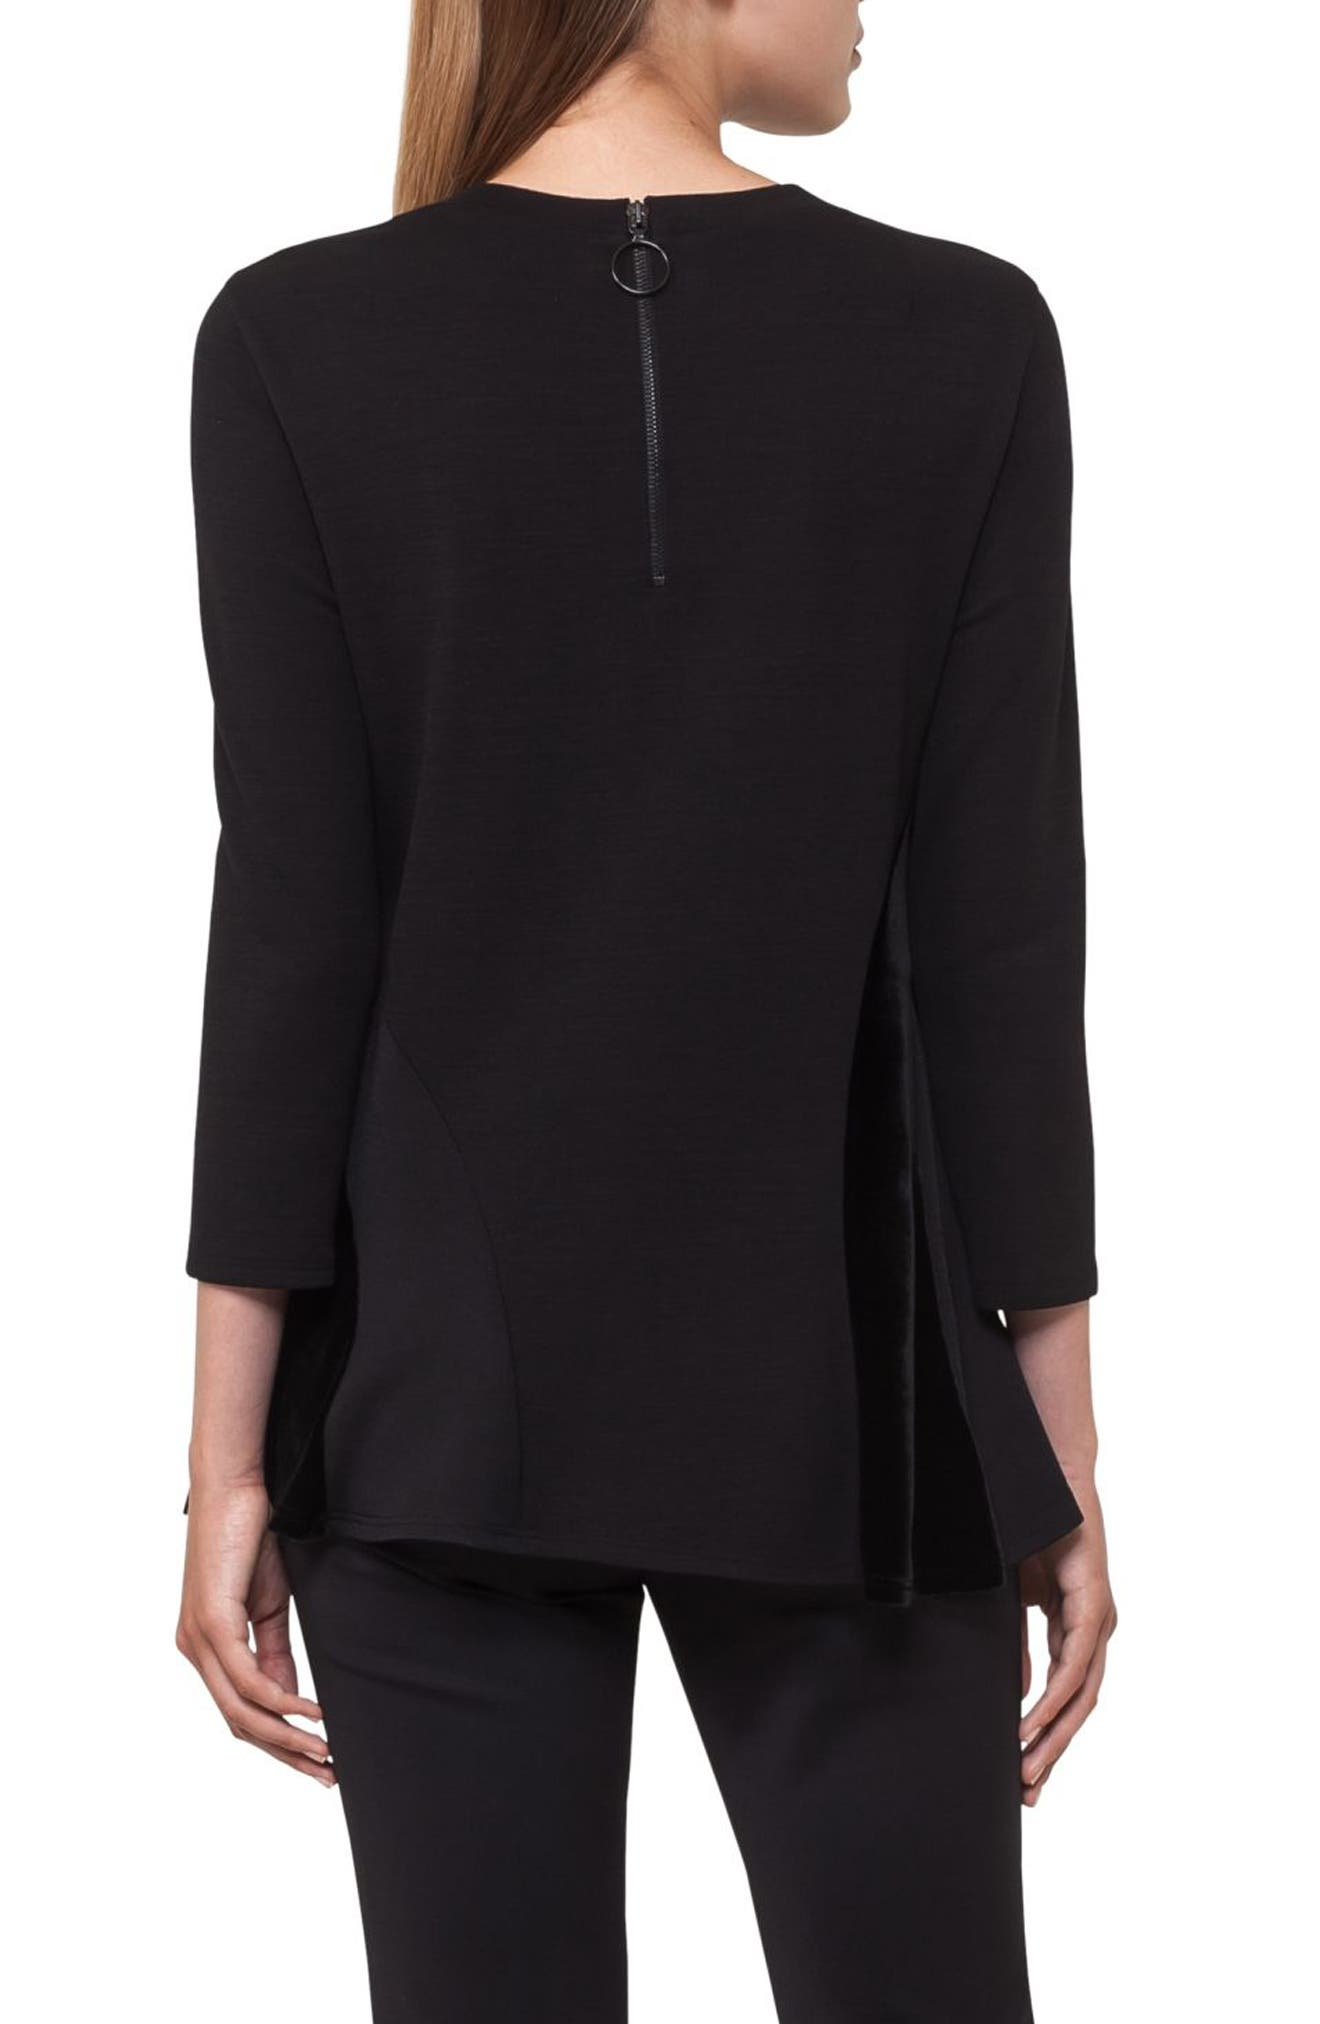 Quad Circle Sweatshirt,                             Alternate thumbnail 2, color,                             Black